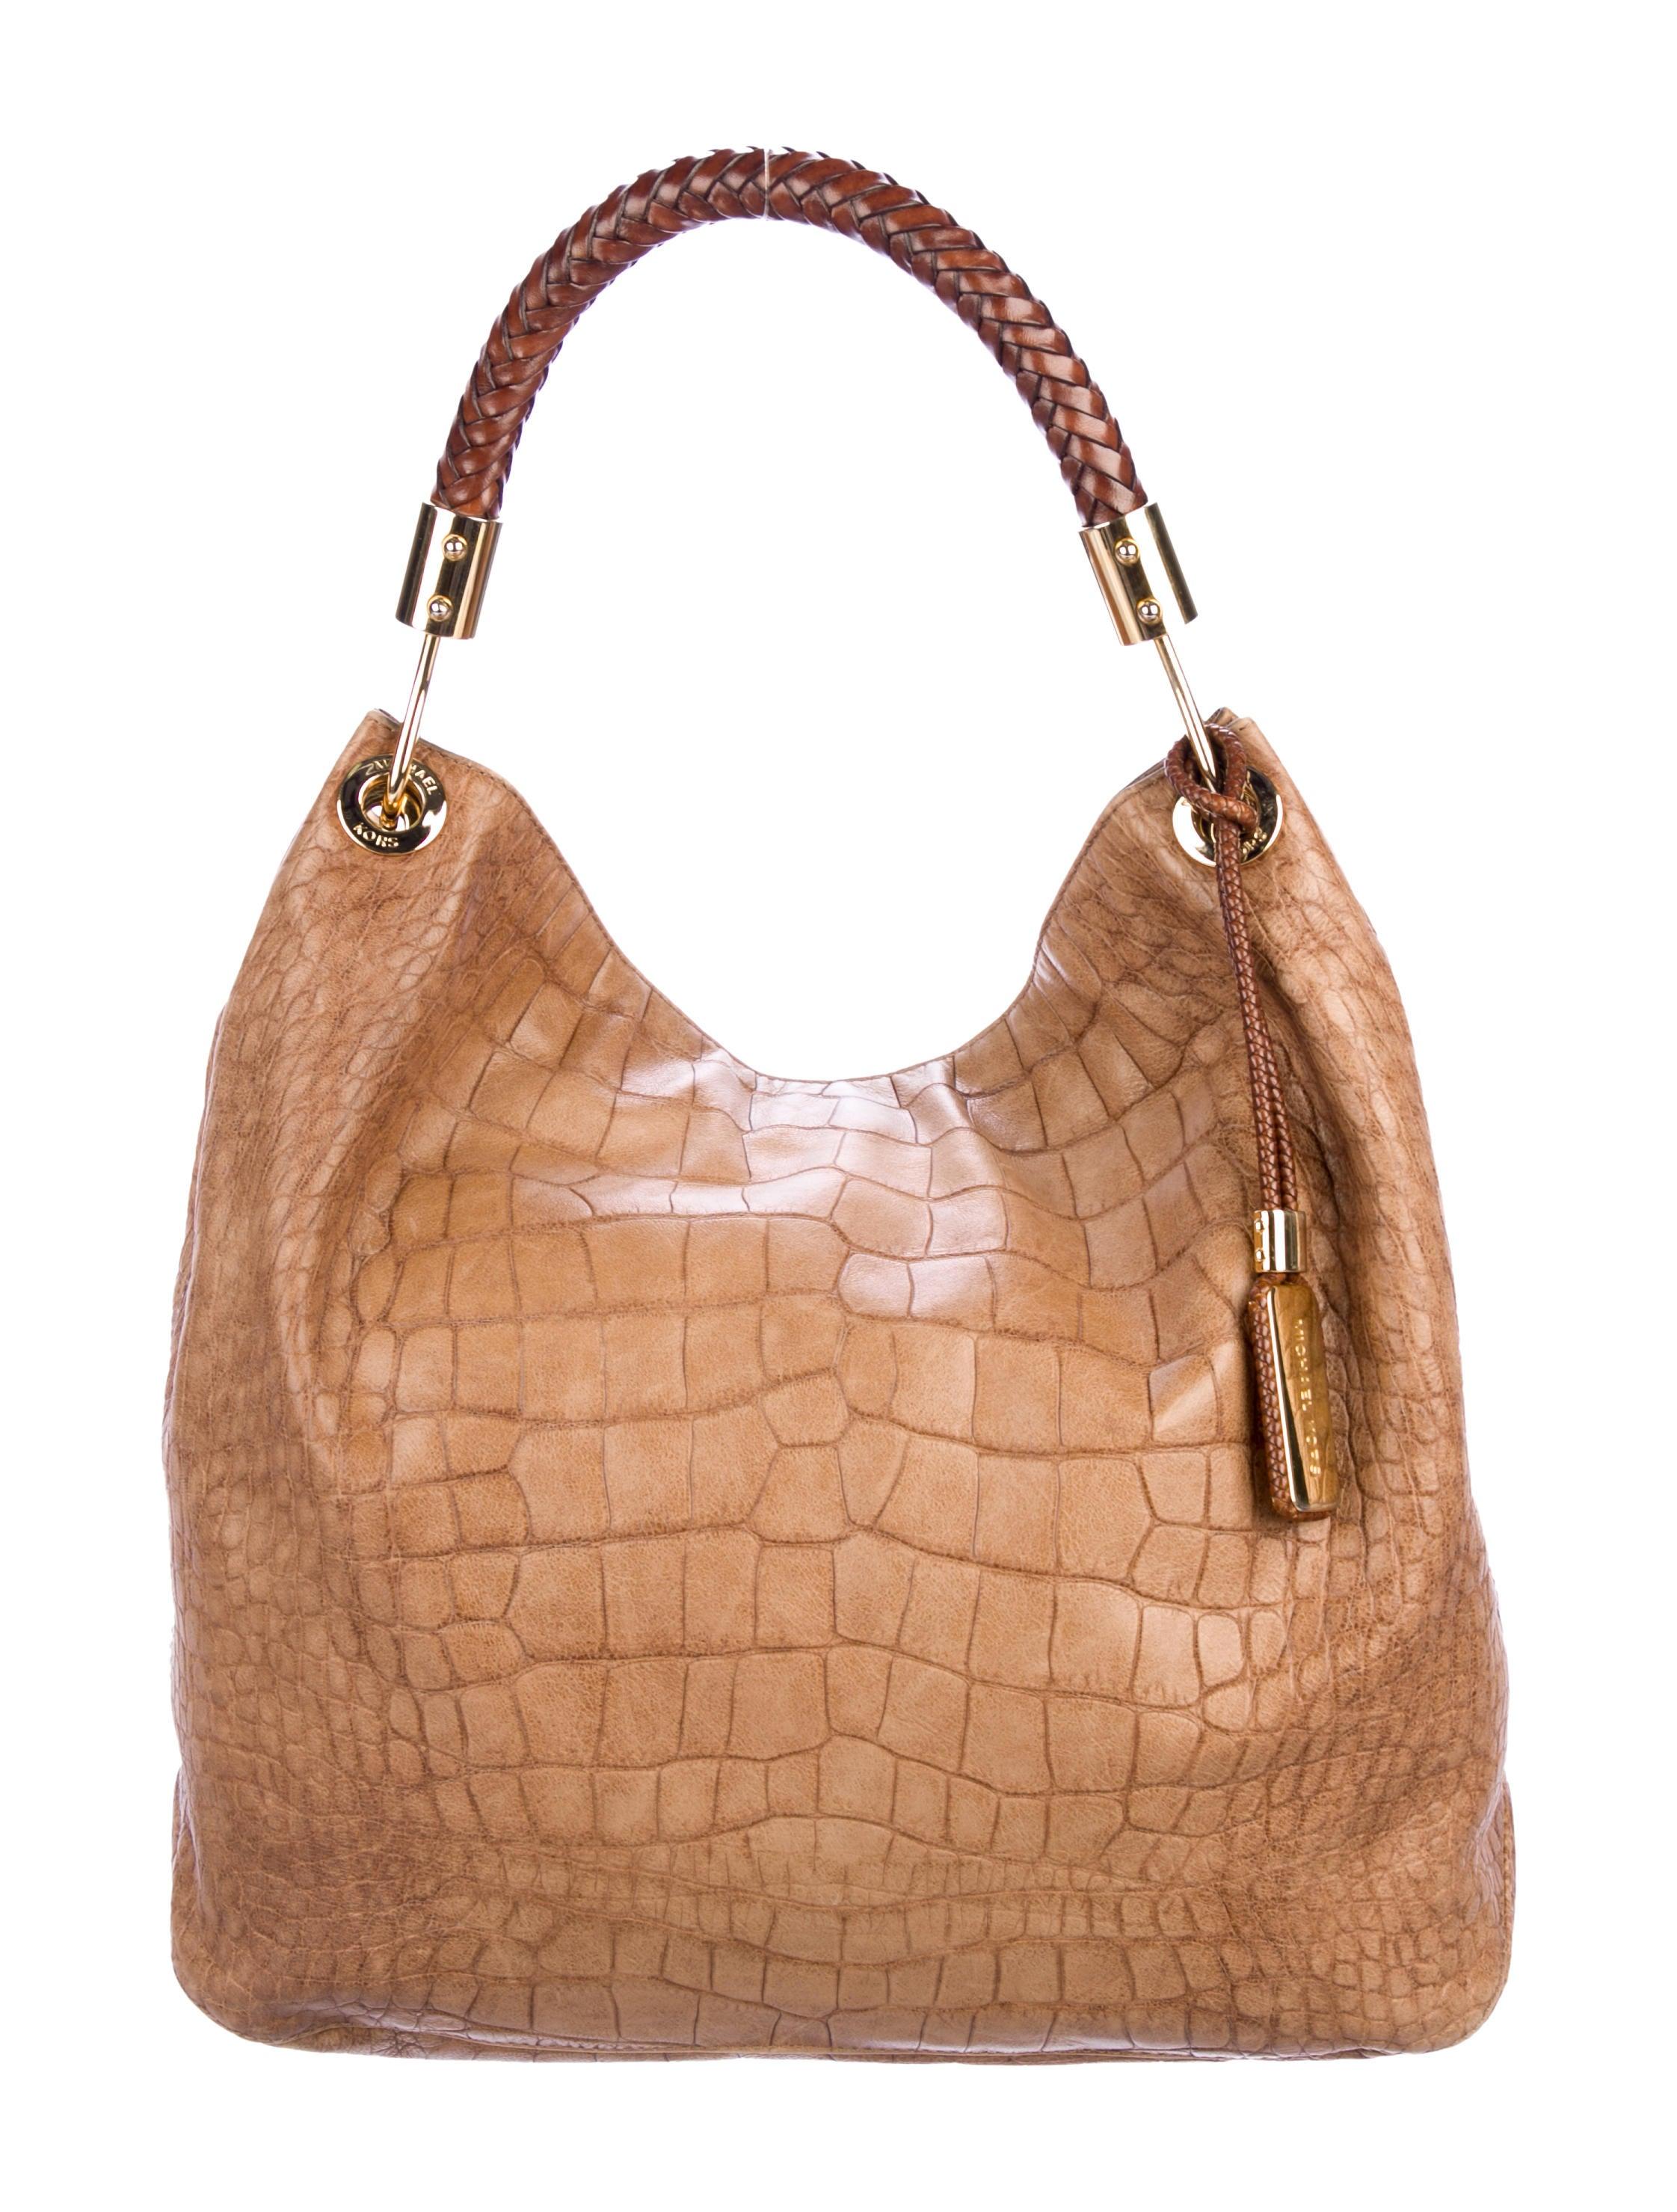 f8ed3f849b3a Michael Kors Embossed Skorpios Hobo - Handbags - MIC77114 | The RealReal